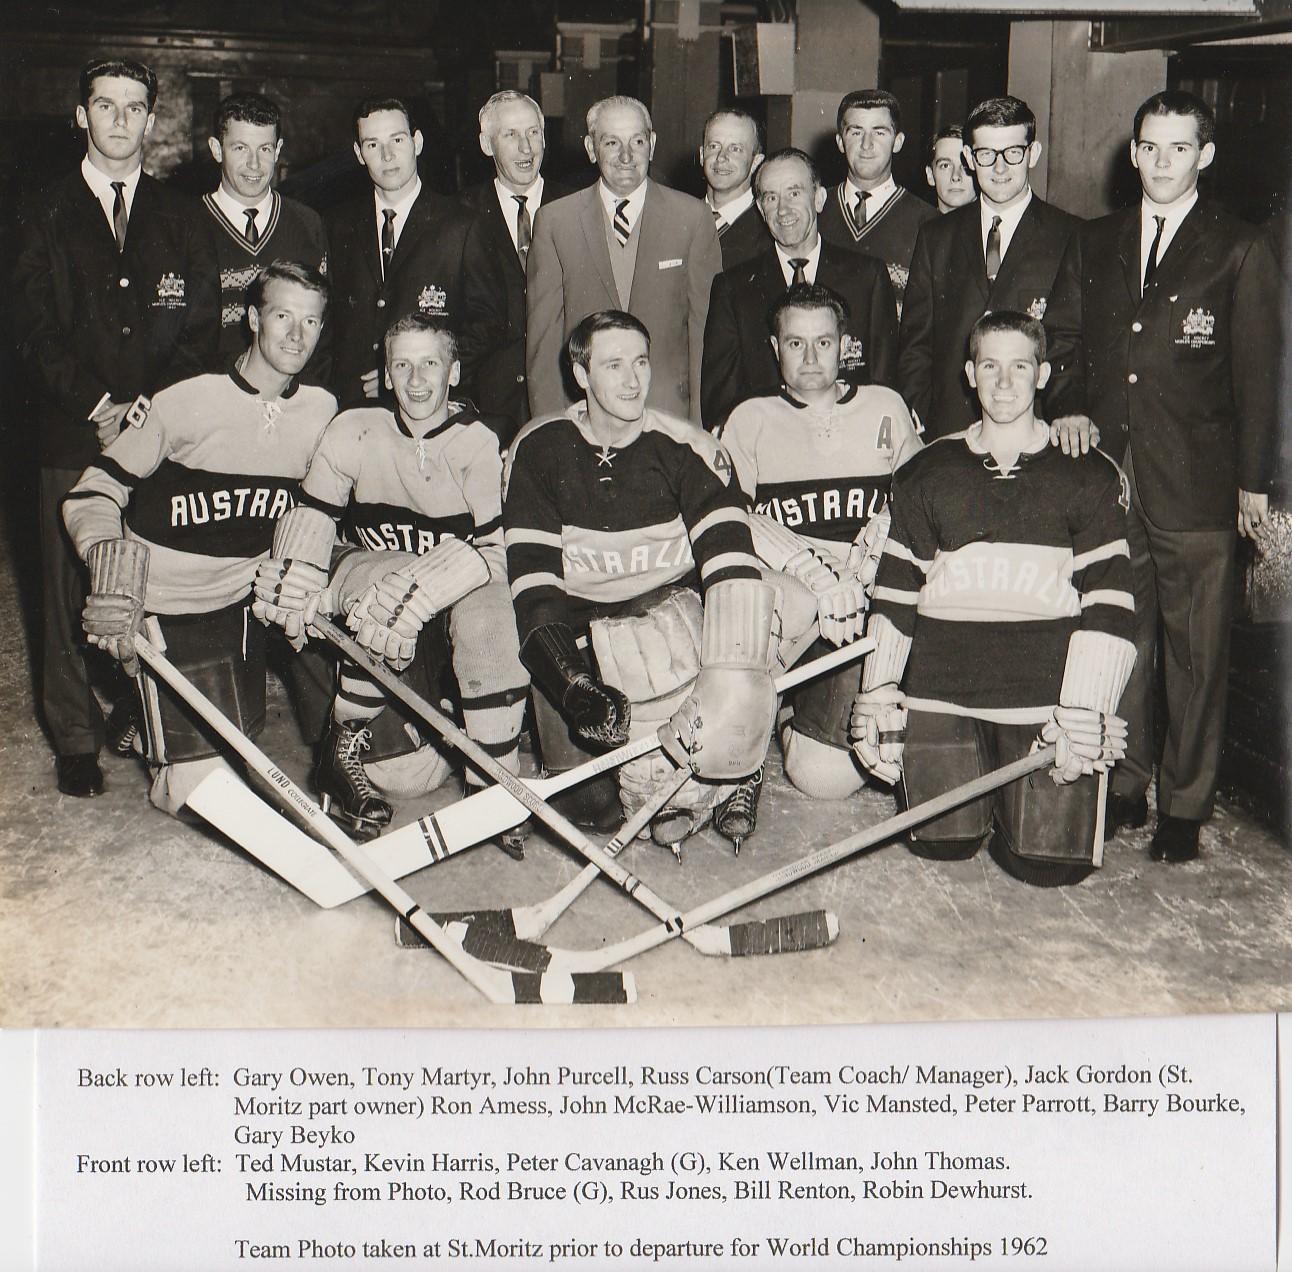 1949 Ice Hockey World Championships